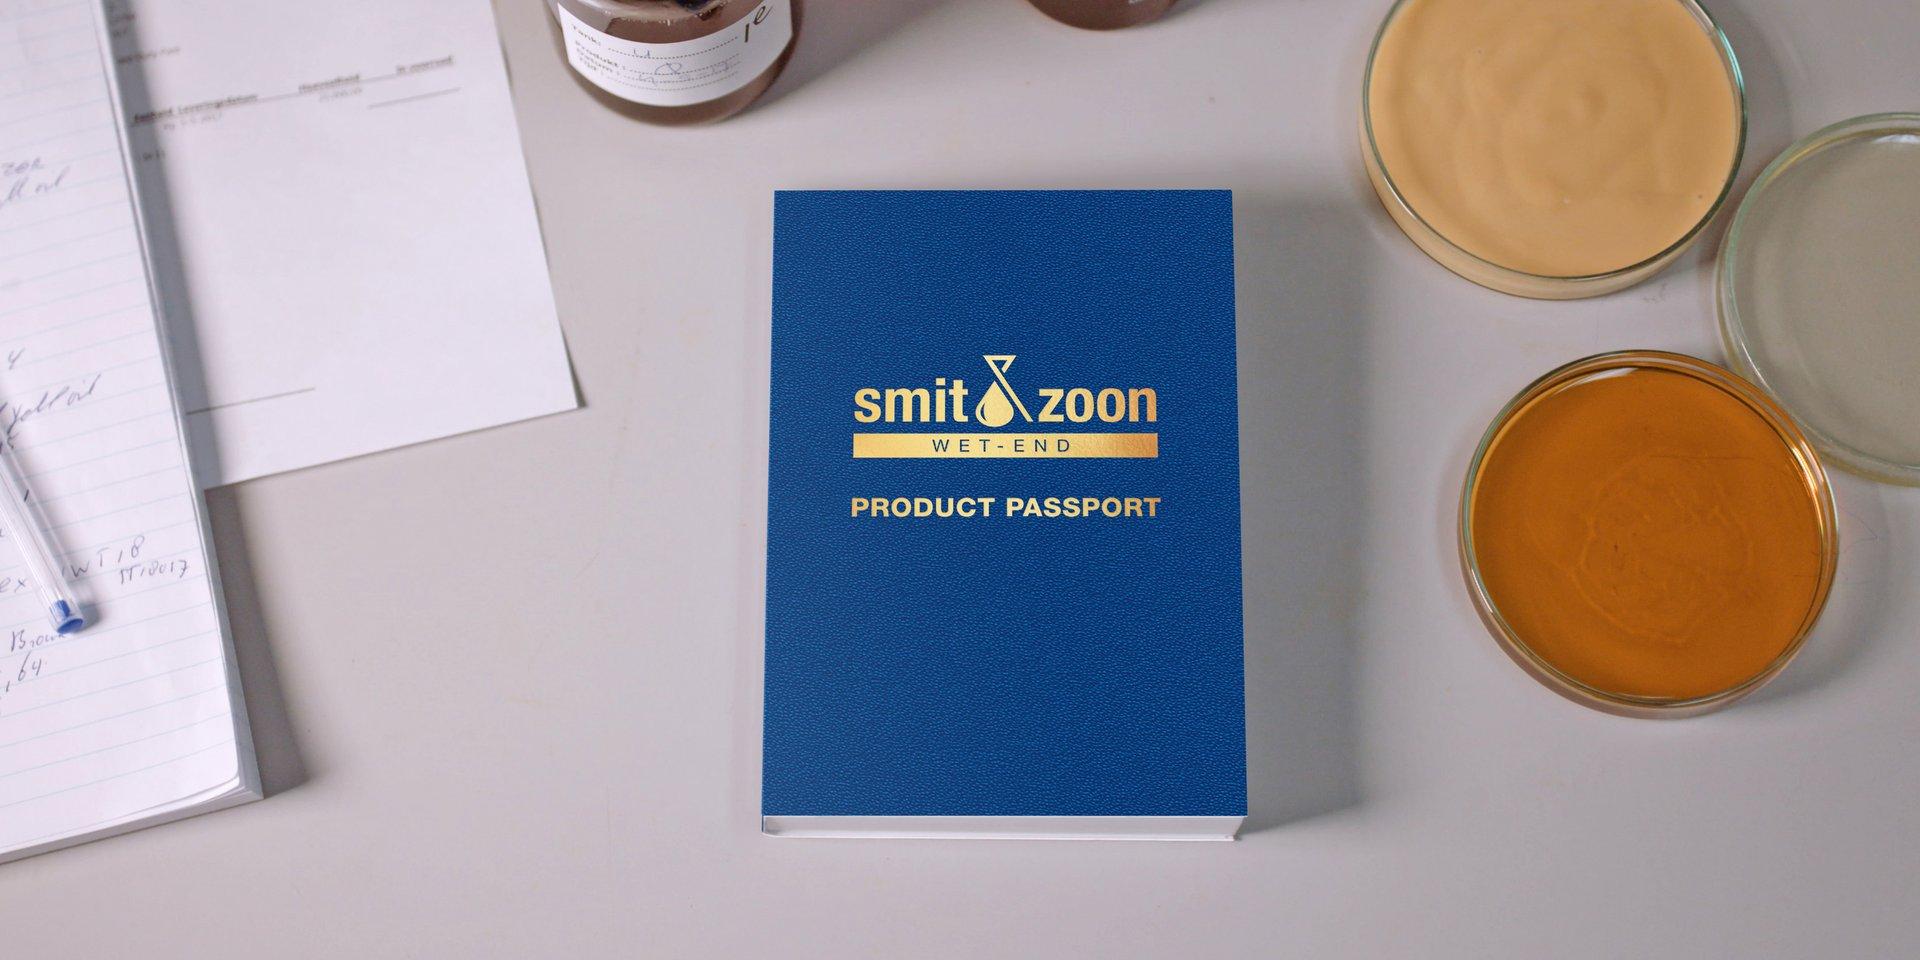 Smit zoon Product Passport.jpg